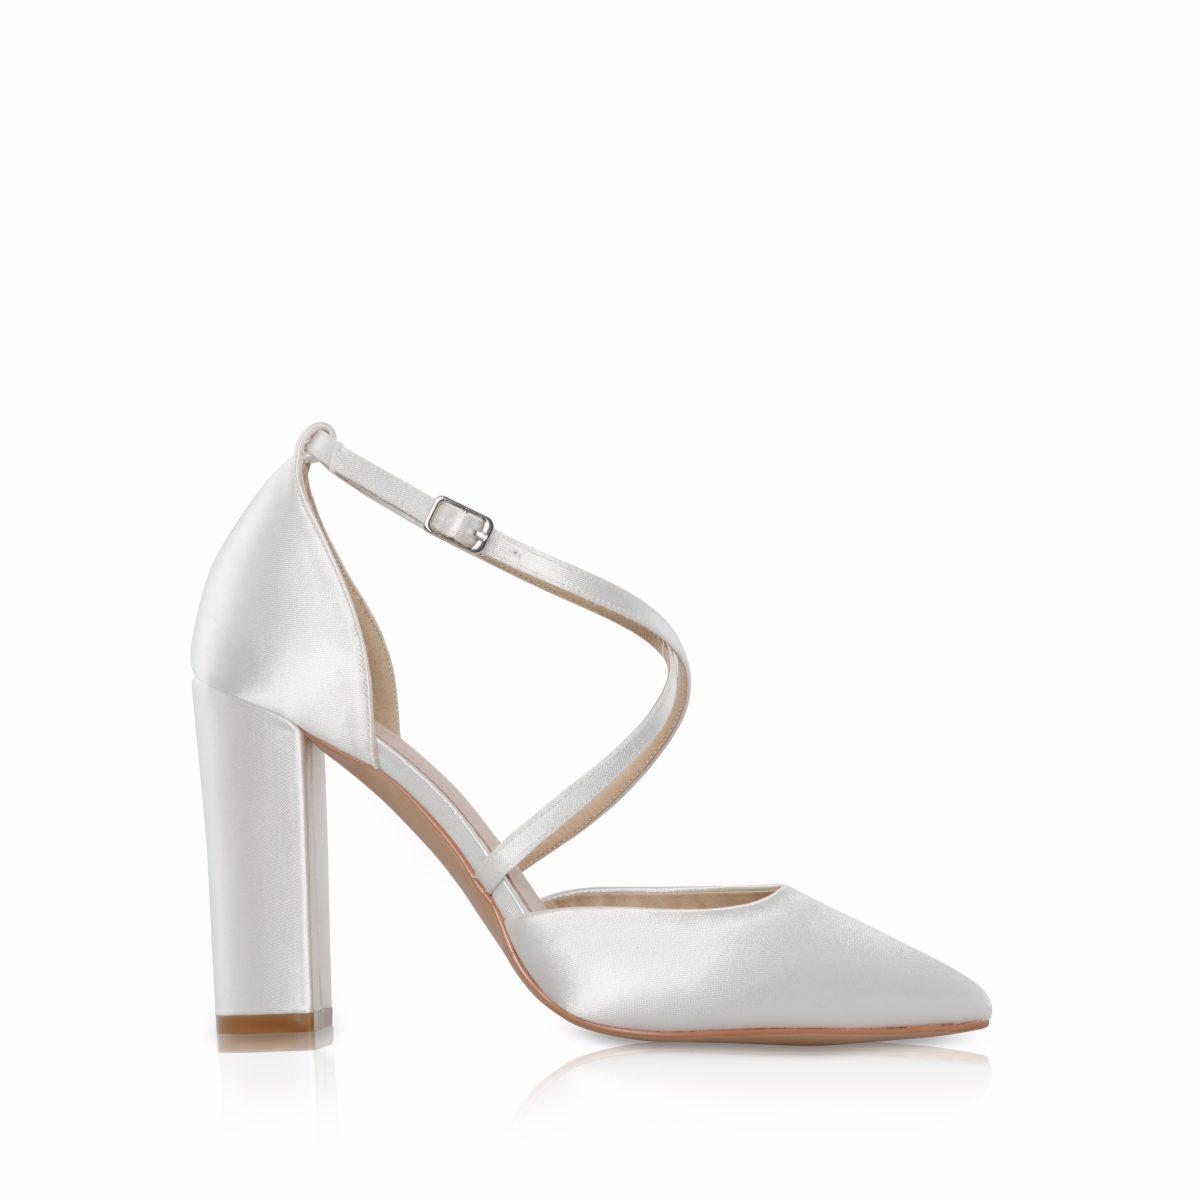 Perfect Bridal Keira Shoes - Ivory Satin 1